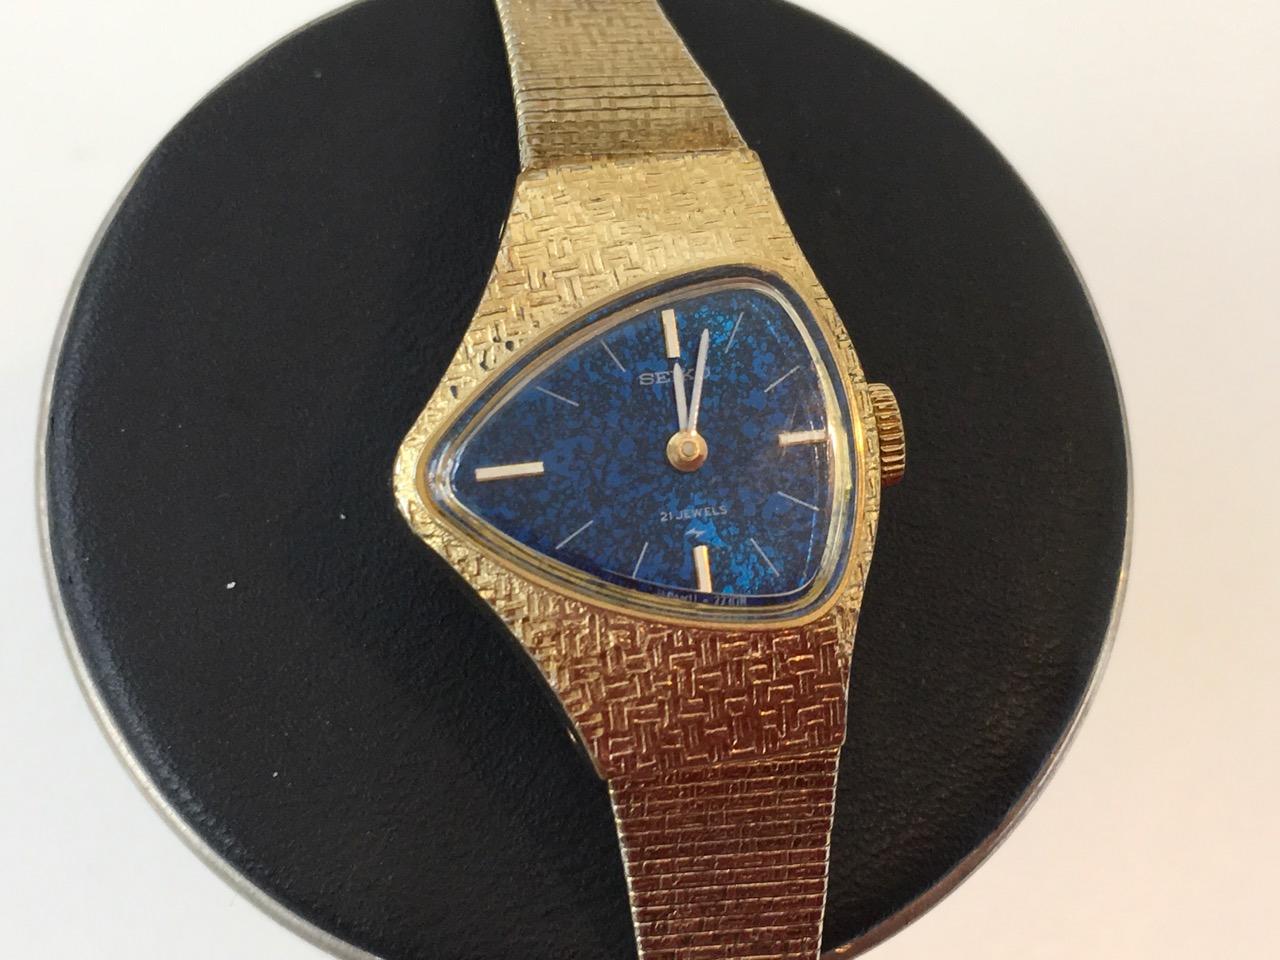 SEIKO セイコー 分解掃除 オーバーホール 手巻き腕時計 腕時計 ウォッチ 修理